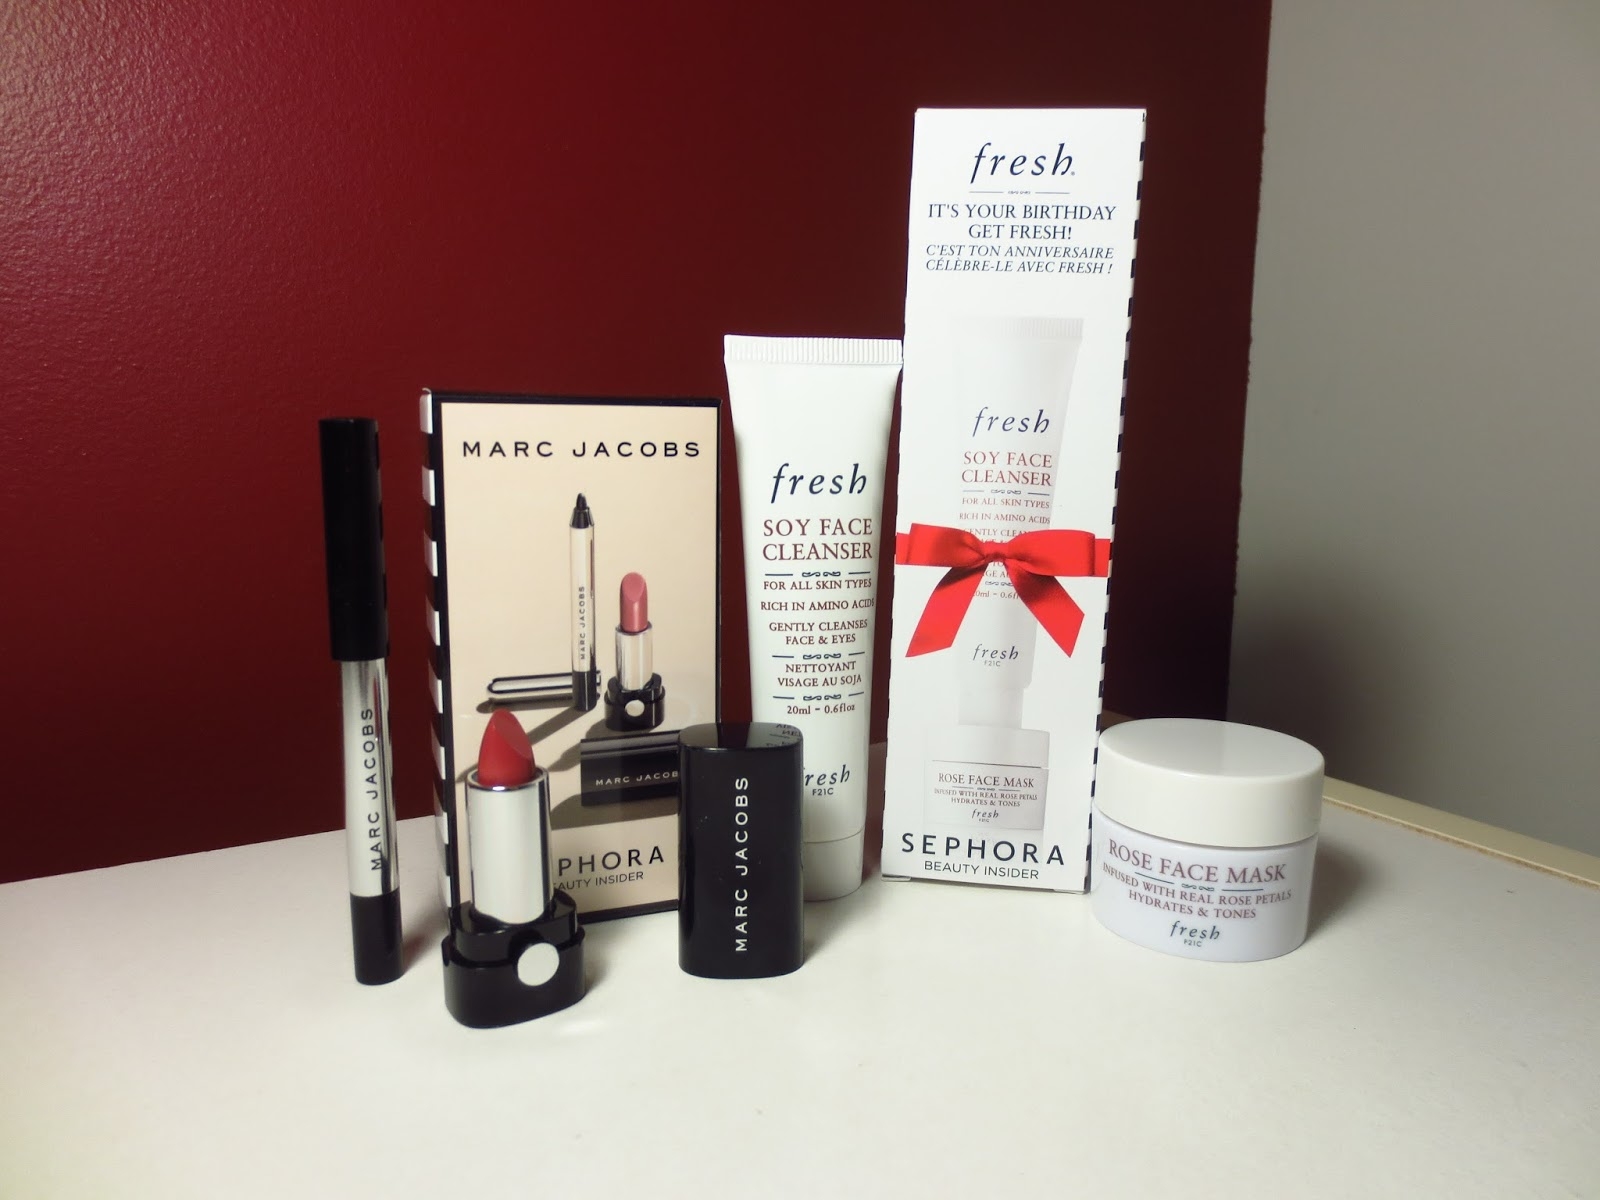 Sephora Beauty Insider Birthday Gift 2016 Marc Jacobs